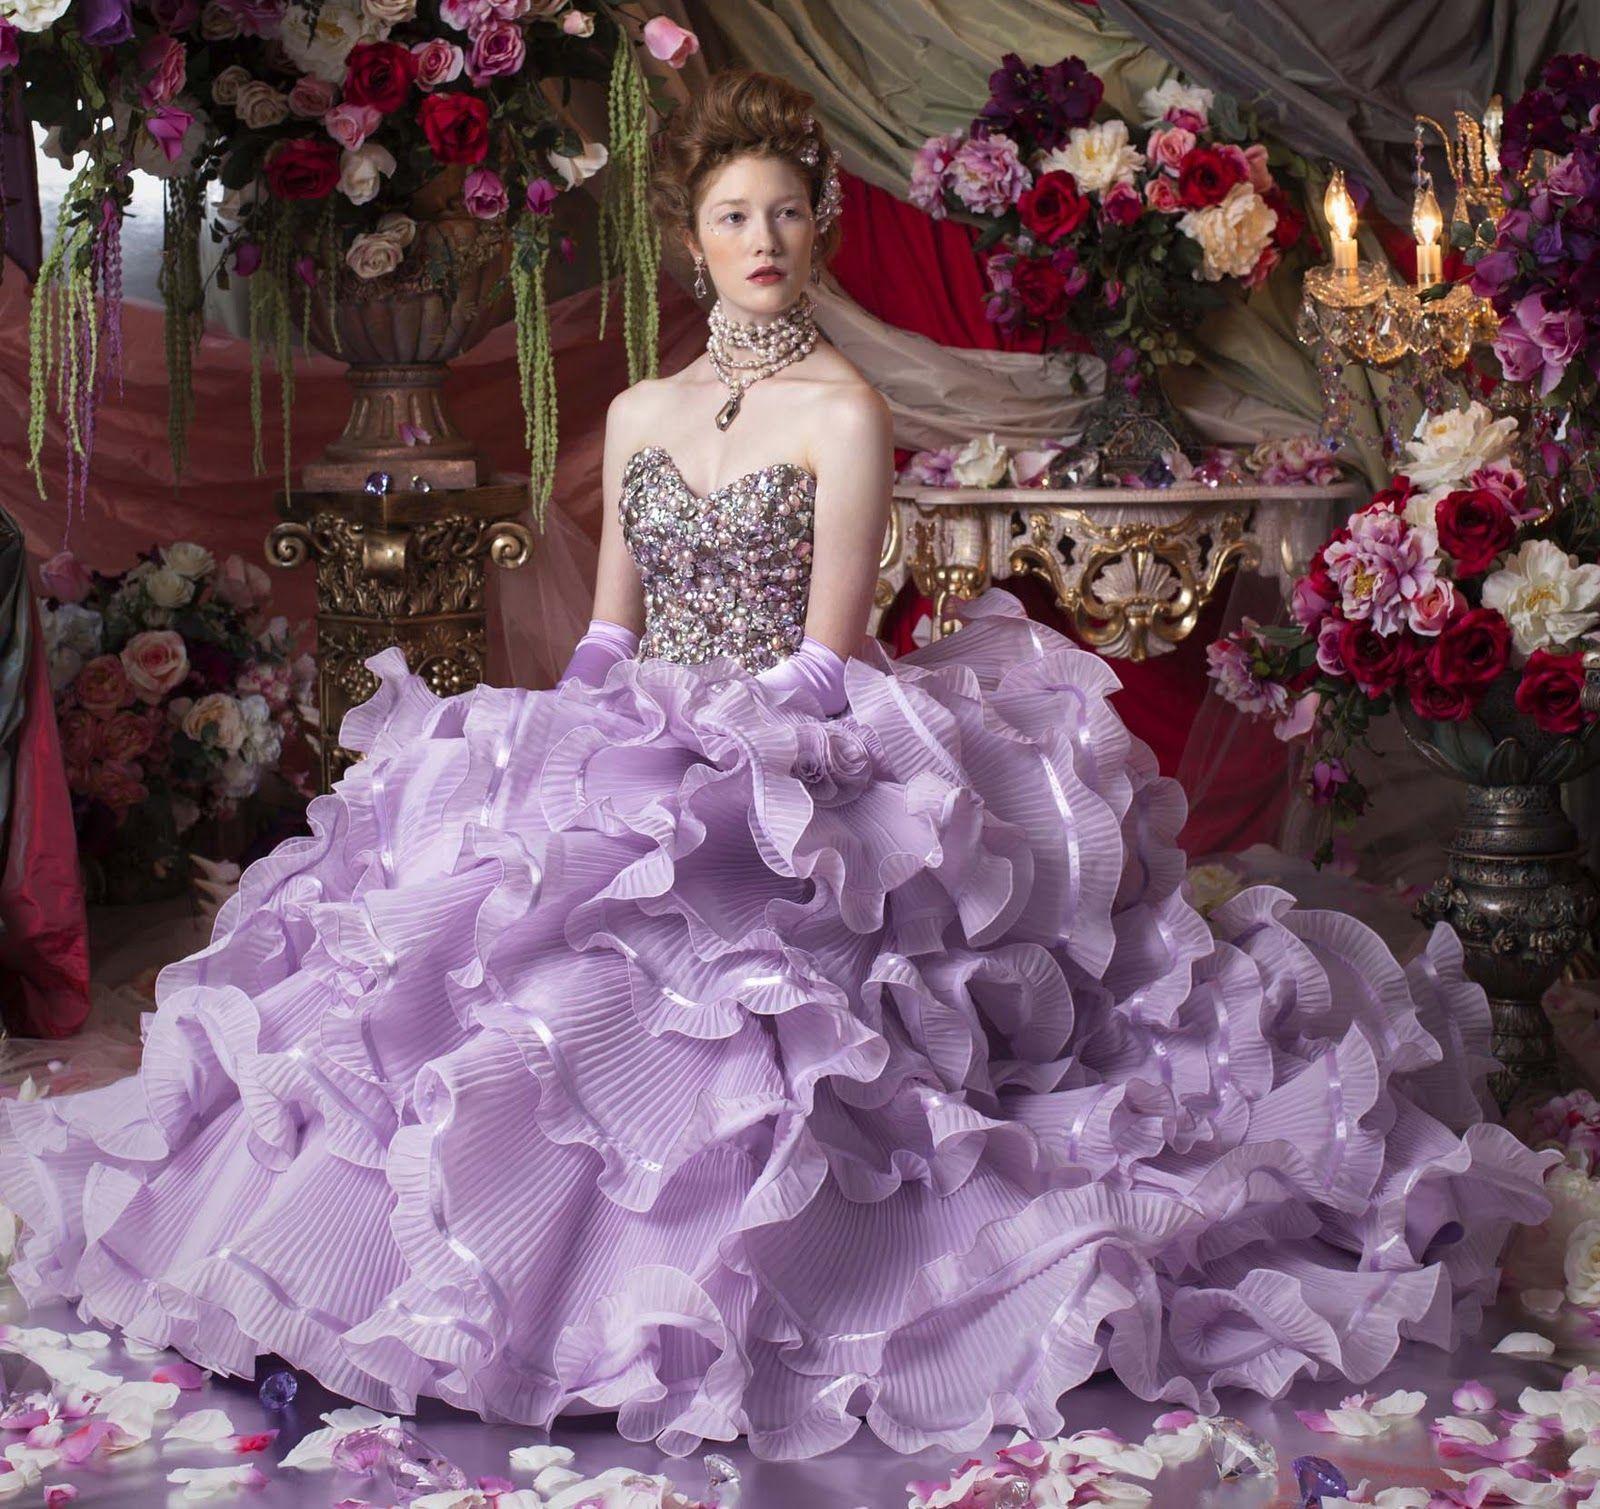 Bridal dreess | Crafts for kids | Pinterest | De novia, Novios y Google